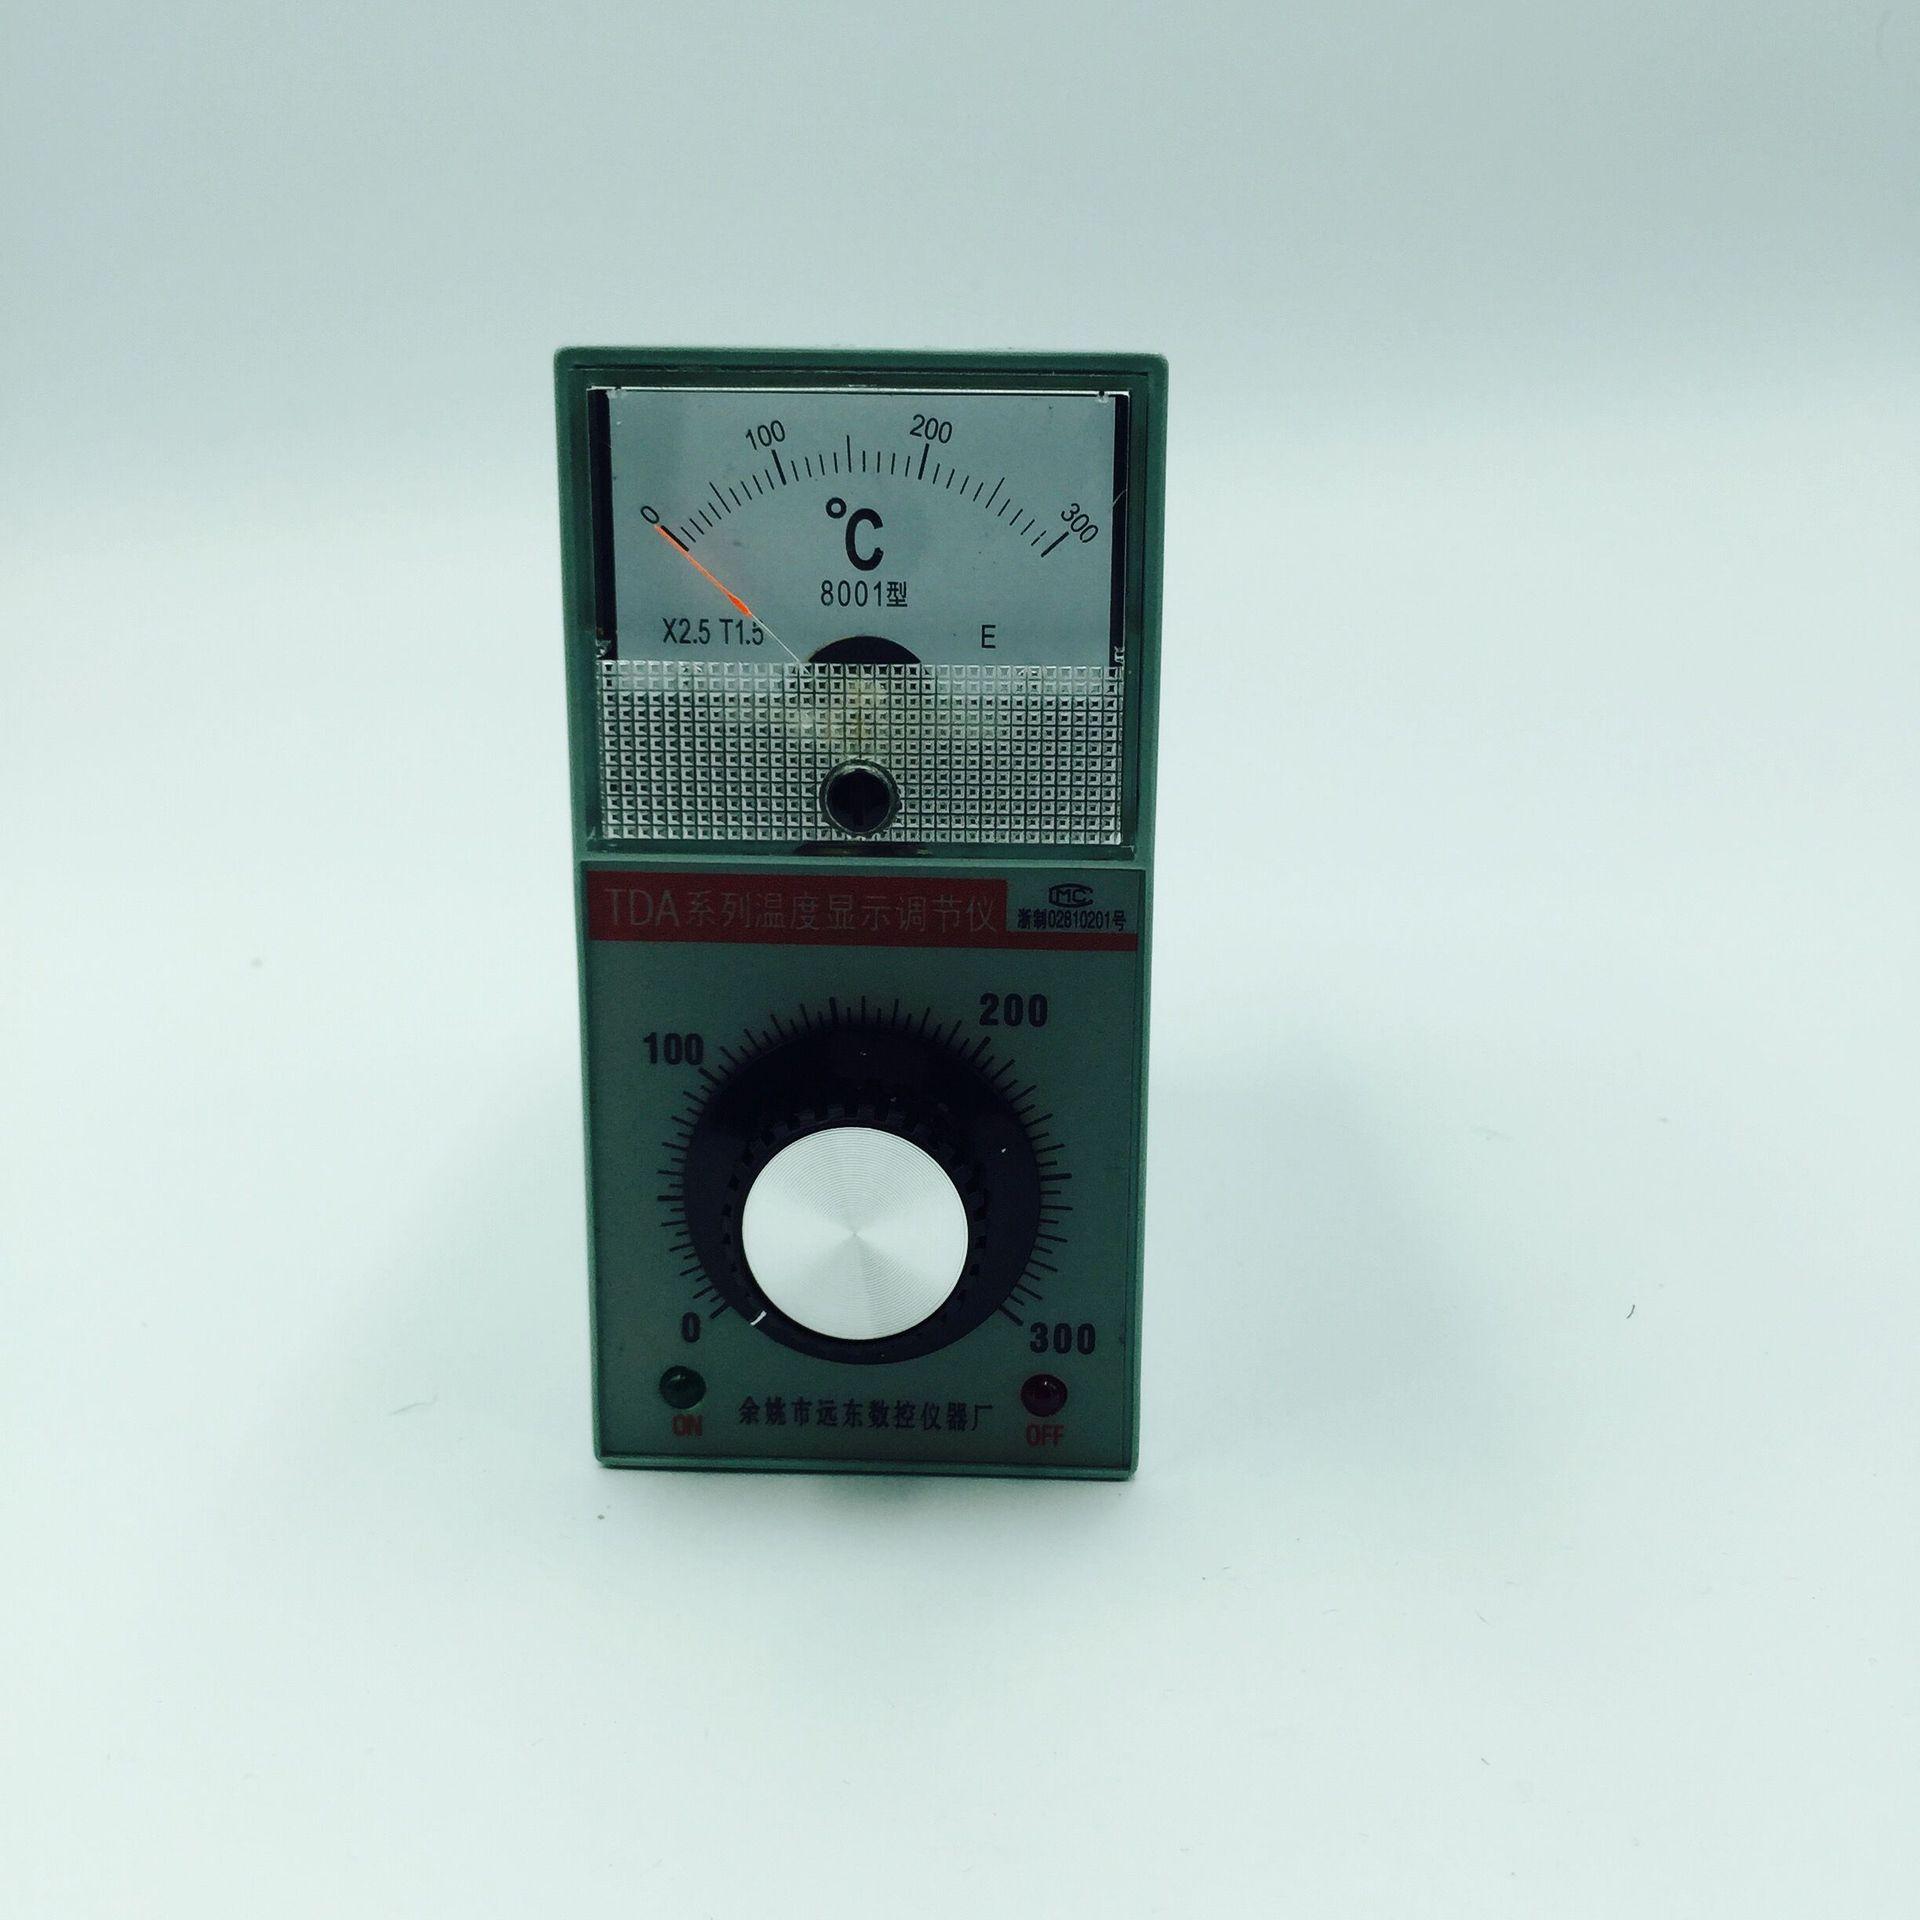 TD系列指针表 数显调节仪 温度调节器